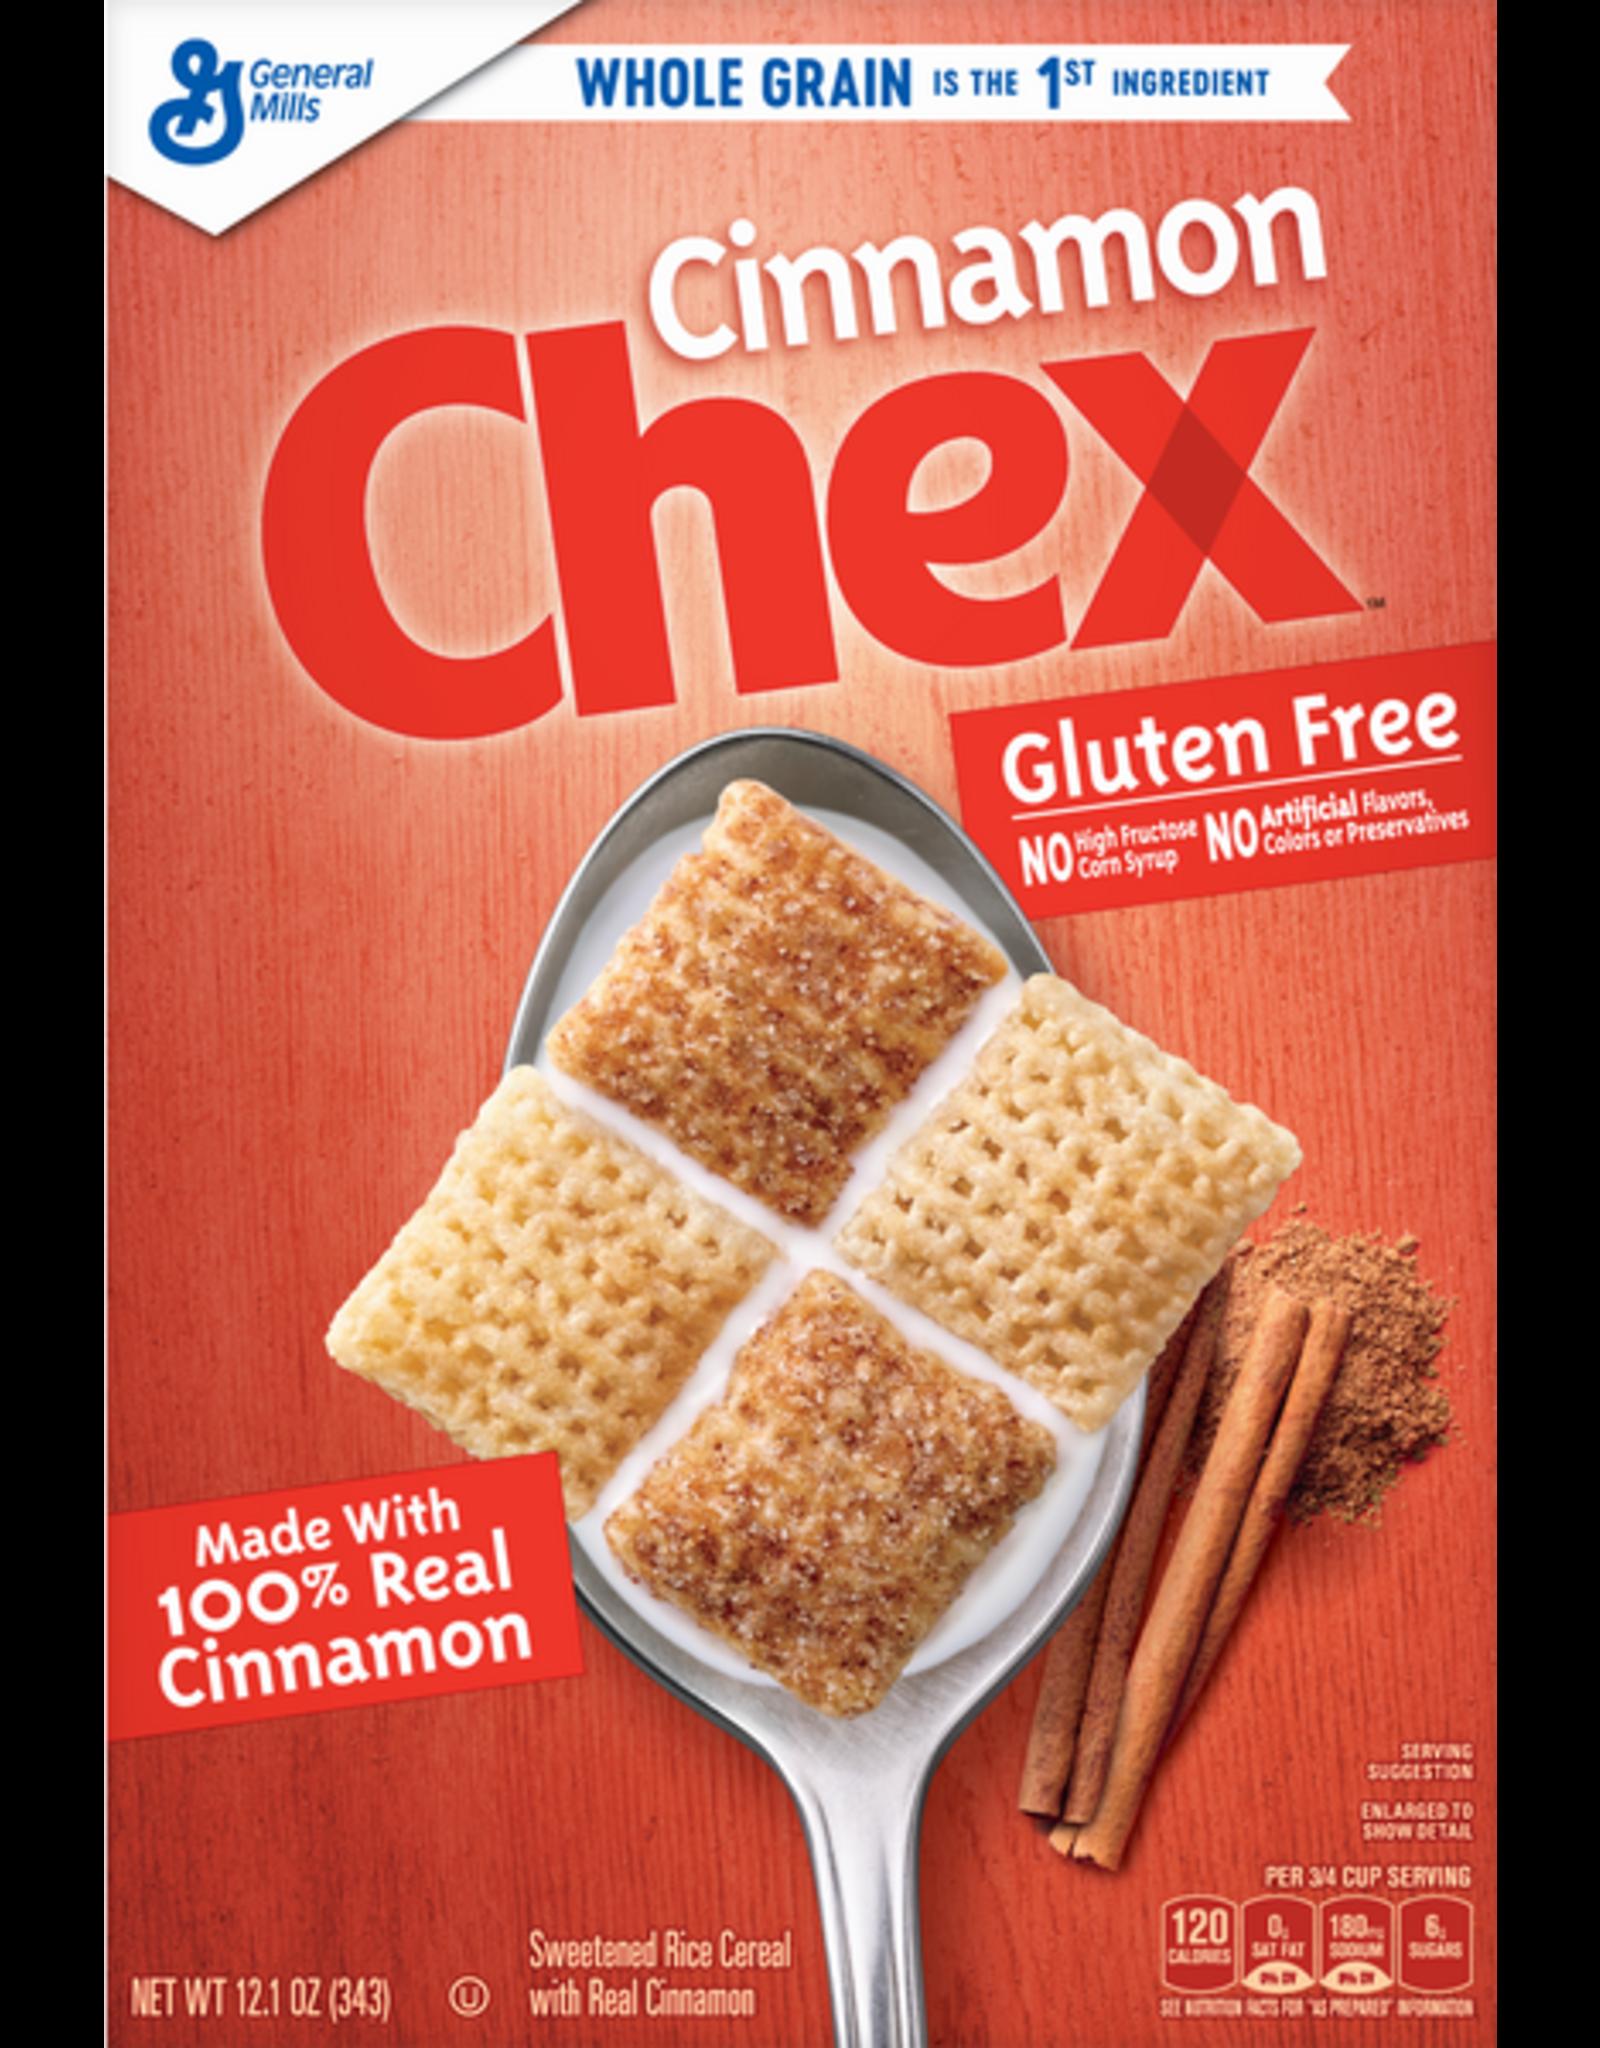 Chex Cinnamon - Gluten Free - 340g